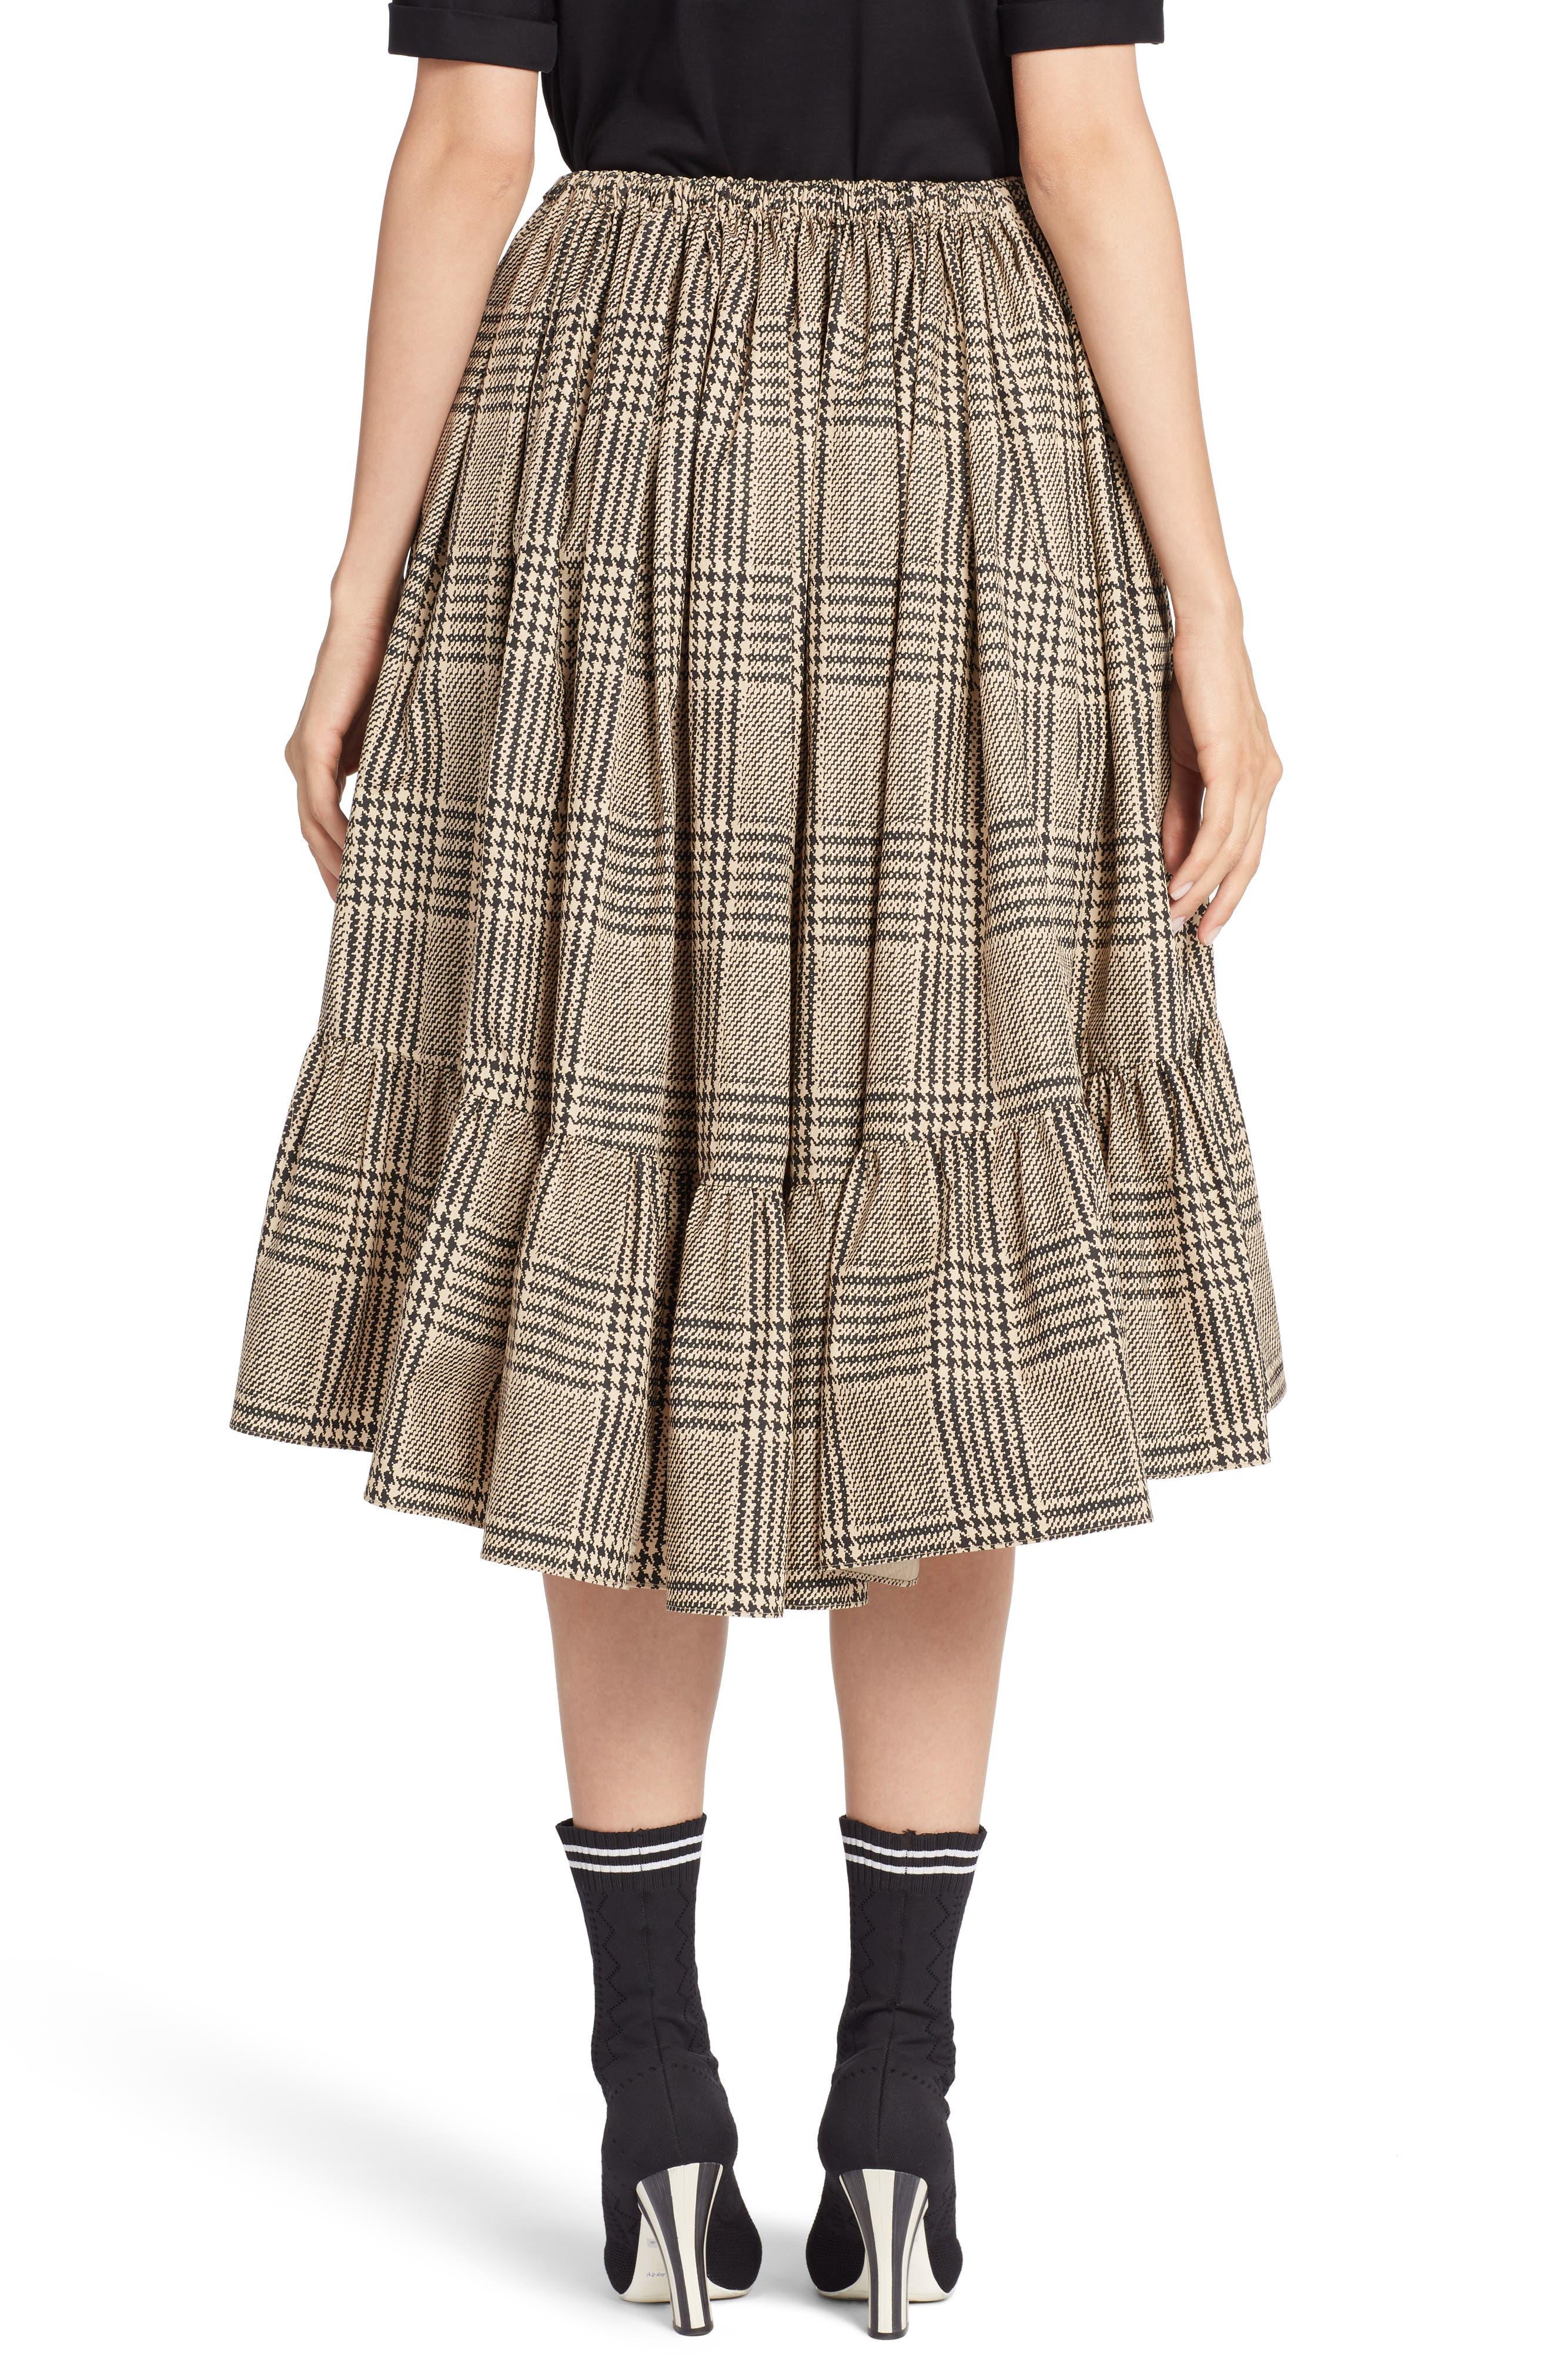 Prince of Wales Ruffle Midi Skirt,                             Alternate thumbnail 2, color,                             001